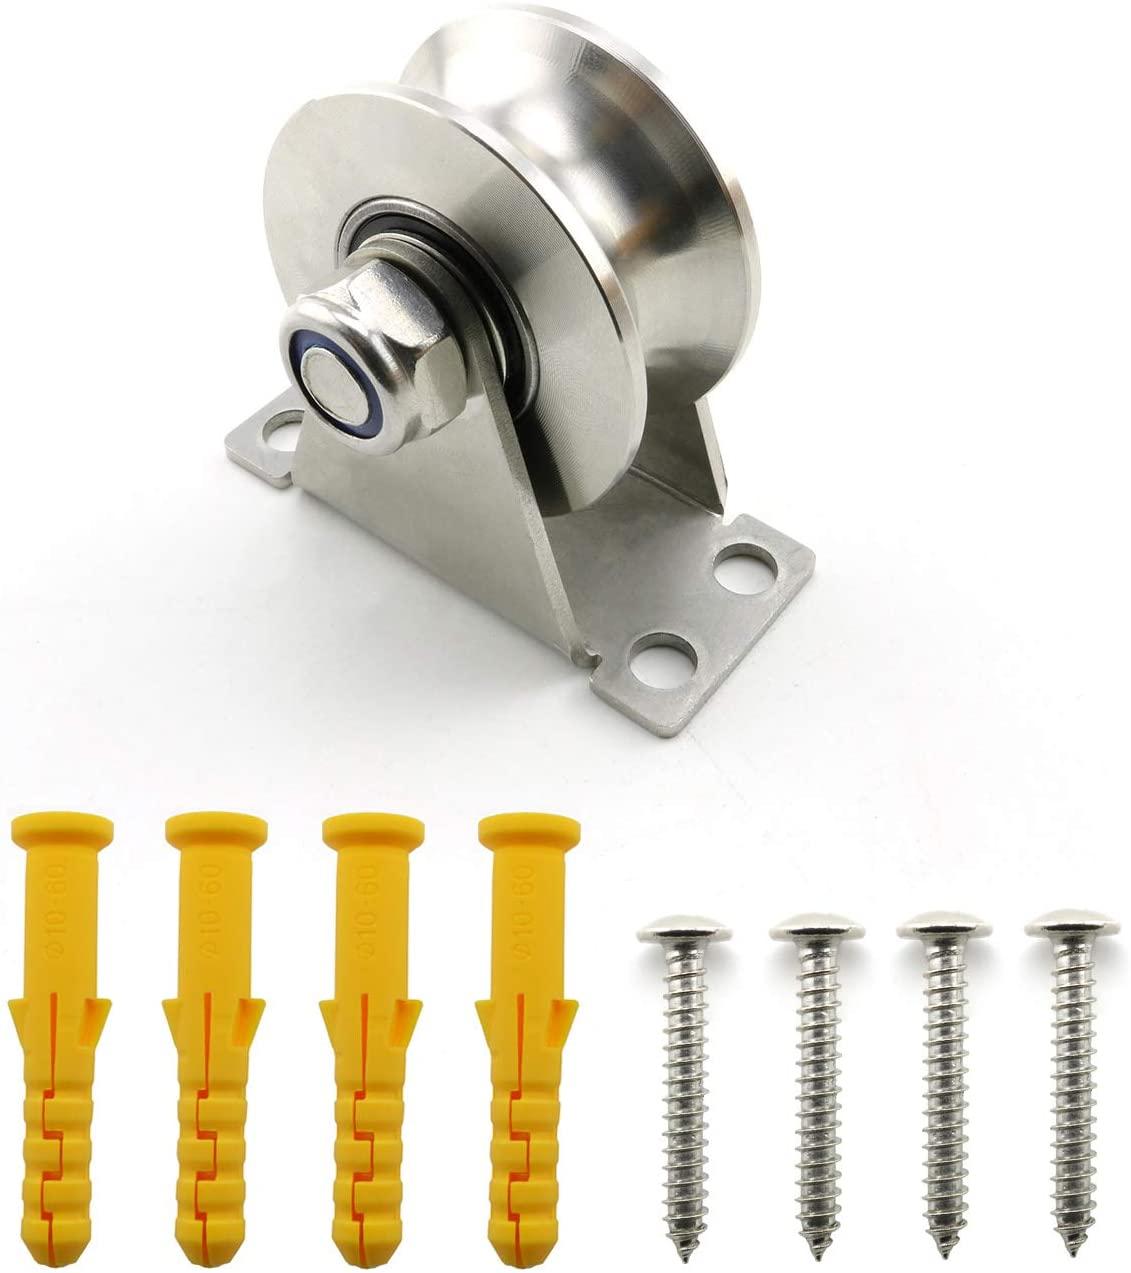 Lind Kitchen 1-Pack U-Type Stainless Steel Pulley Block Mute Bearings Groove Sliding Roller Track Wheel